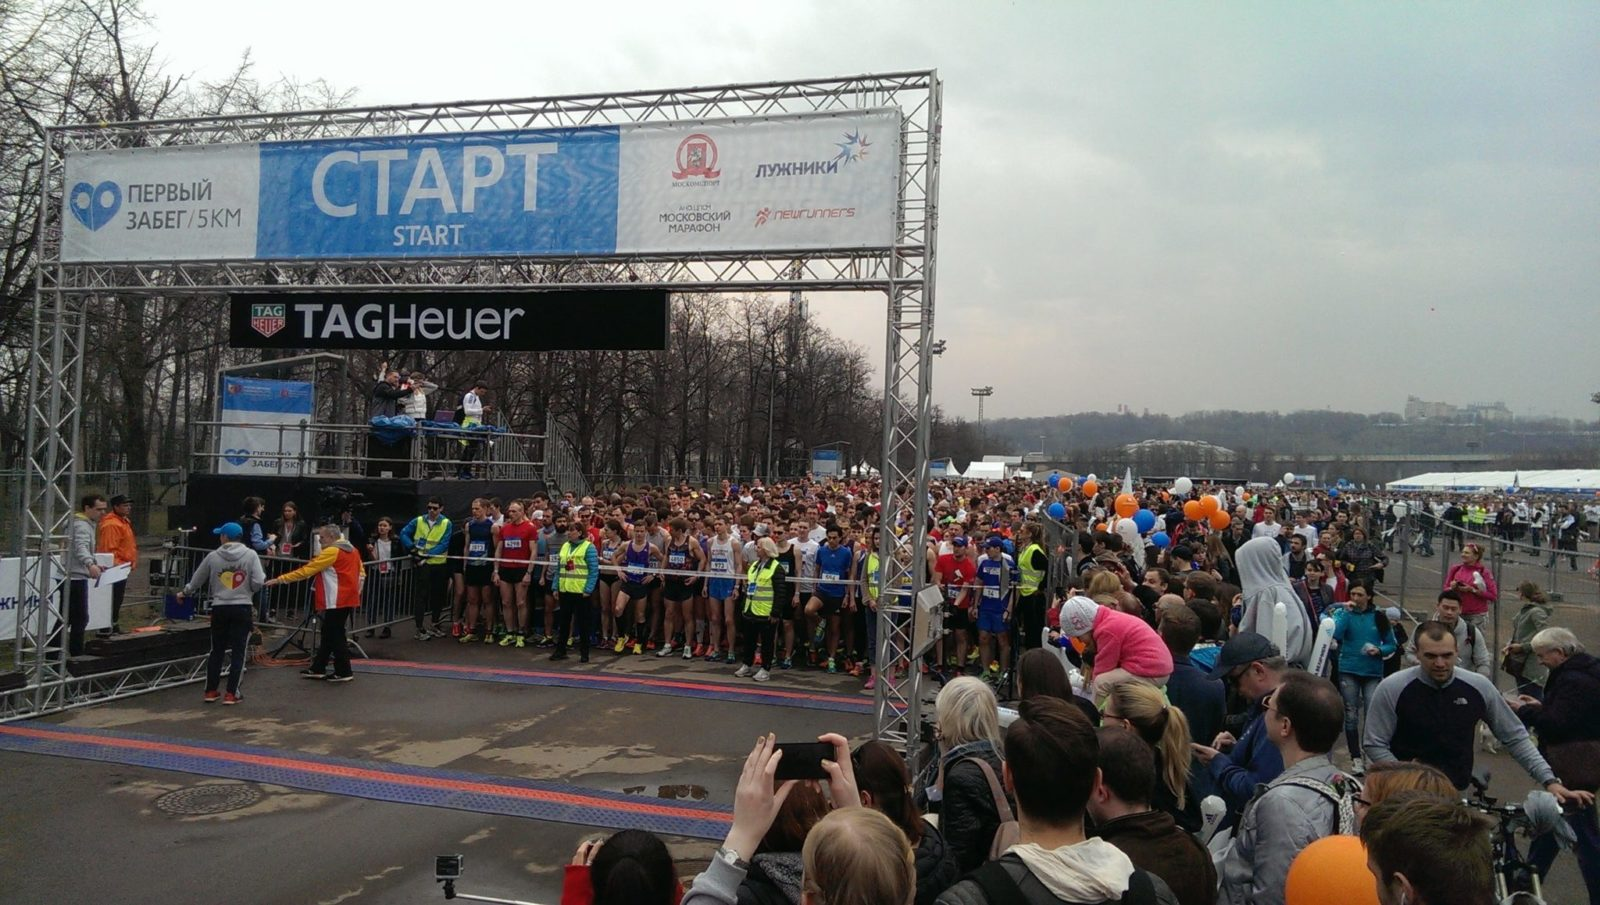 FIRST RUN 5 KM, ЛУЖНИКИ 10.4.2016